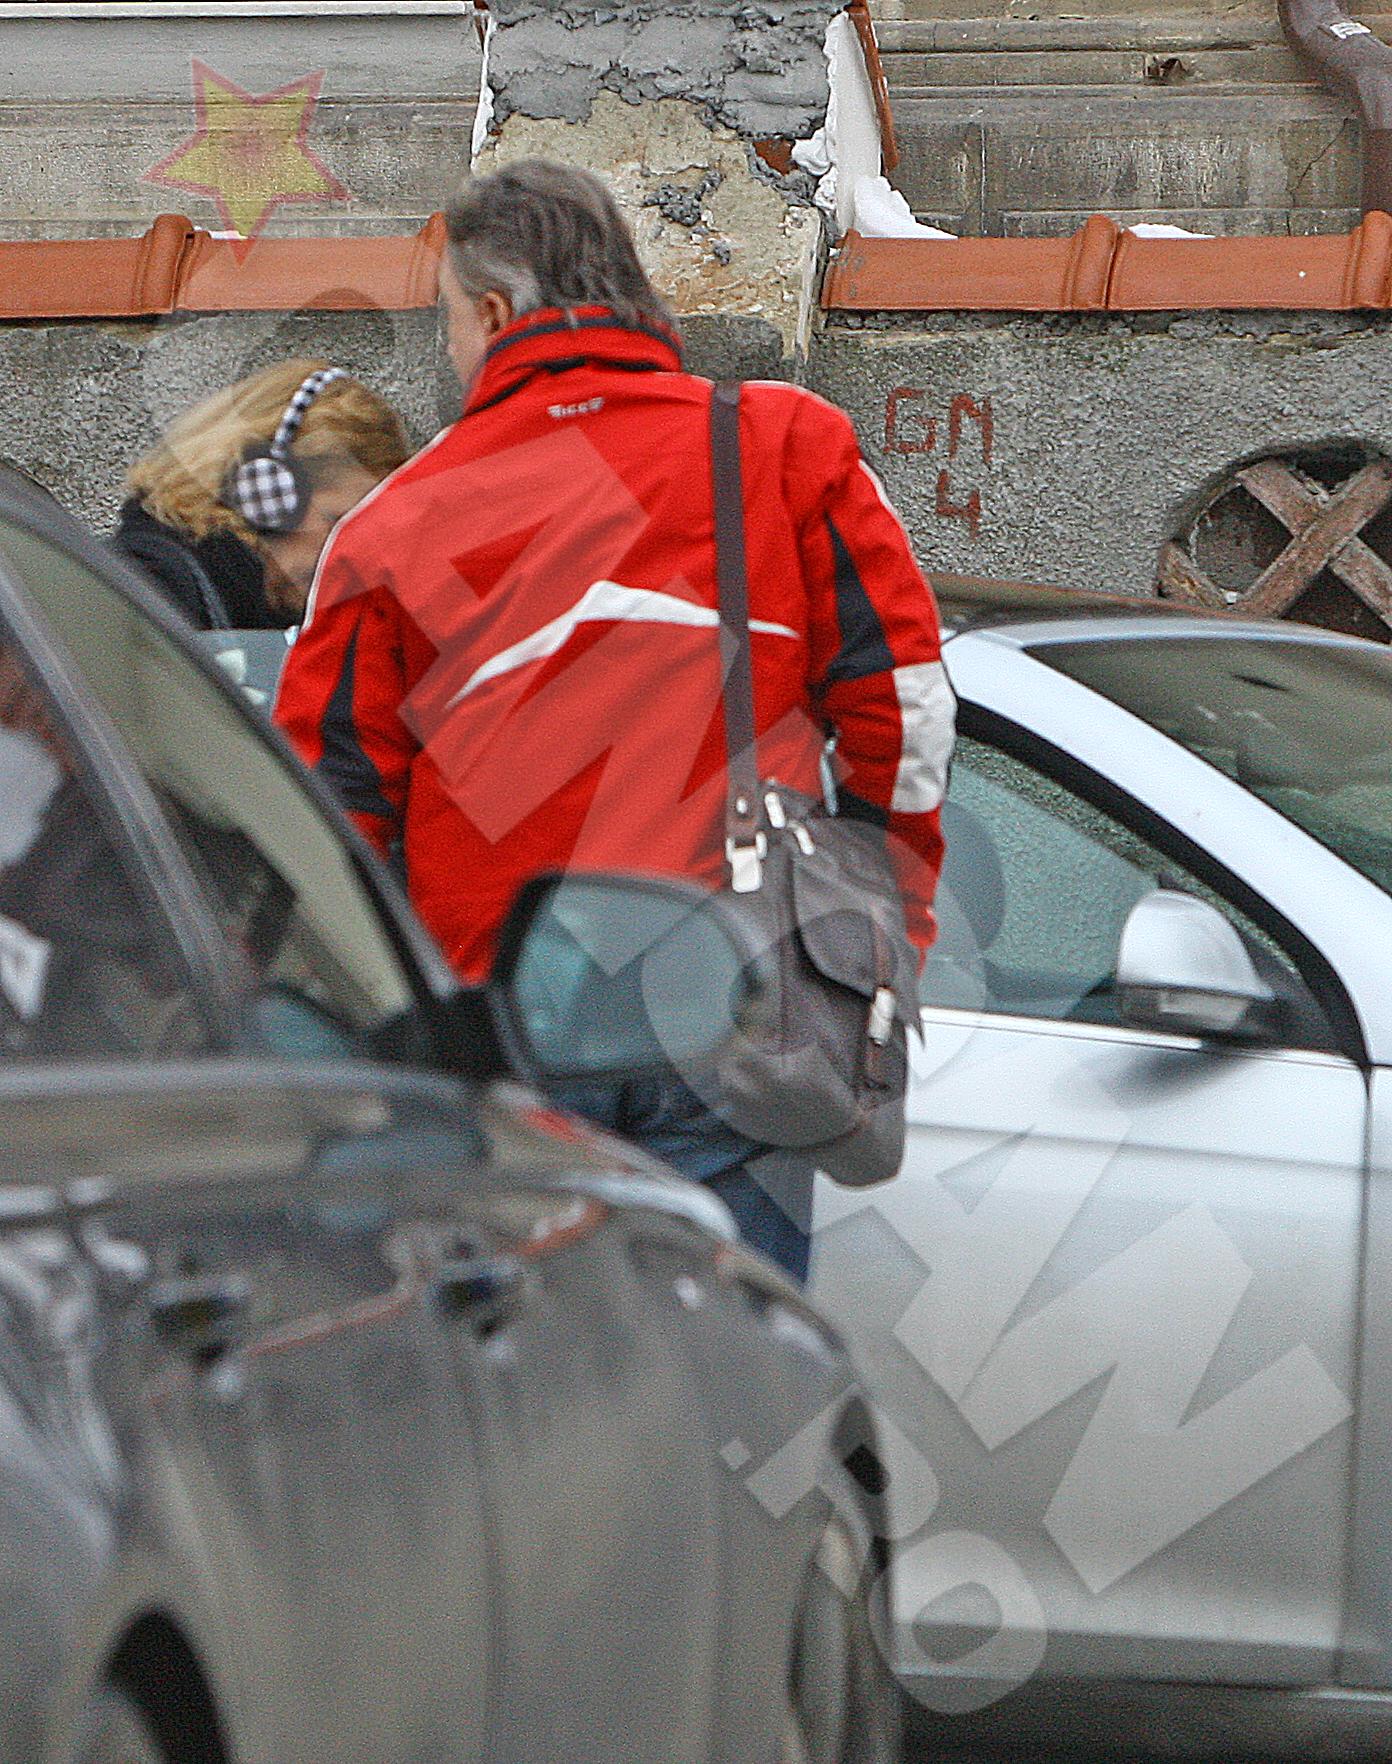 Sotul e galant cu Raluca Moianu si i-a deschis portiera